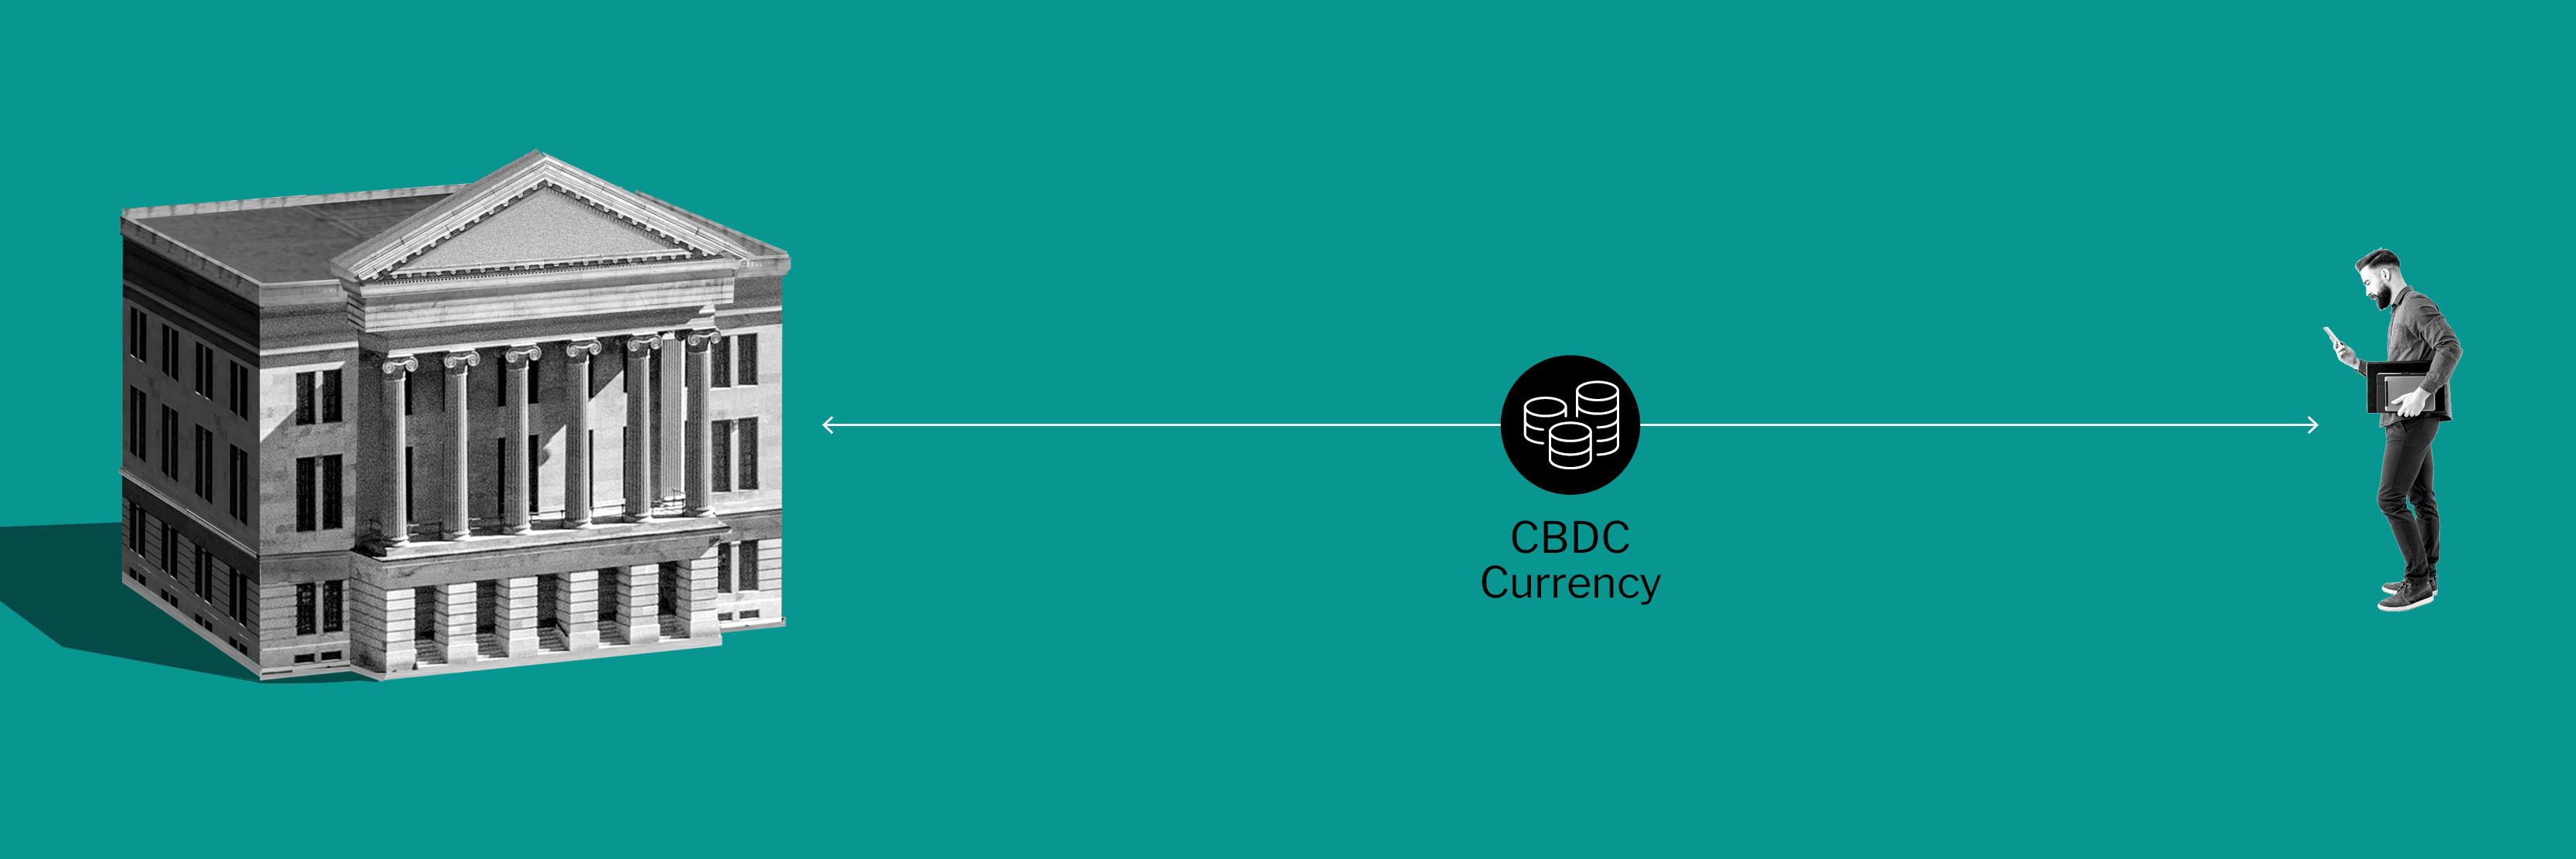 Illustration depicting direct CBDC model